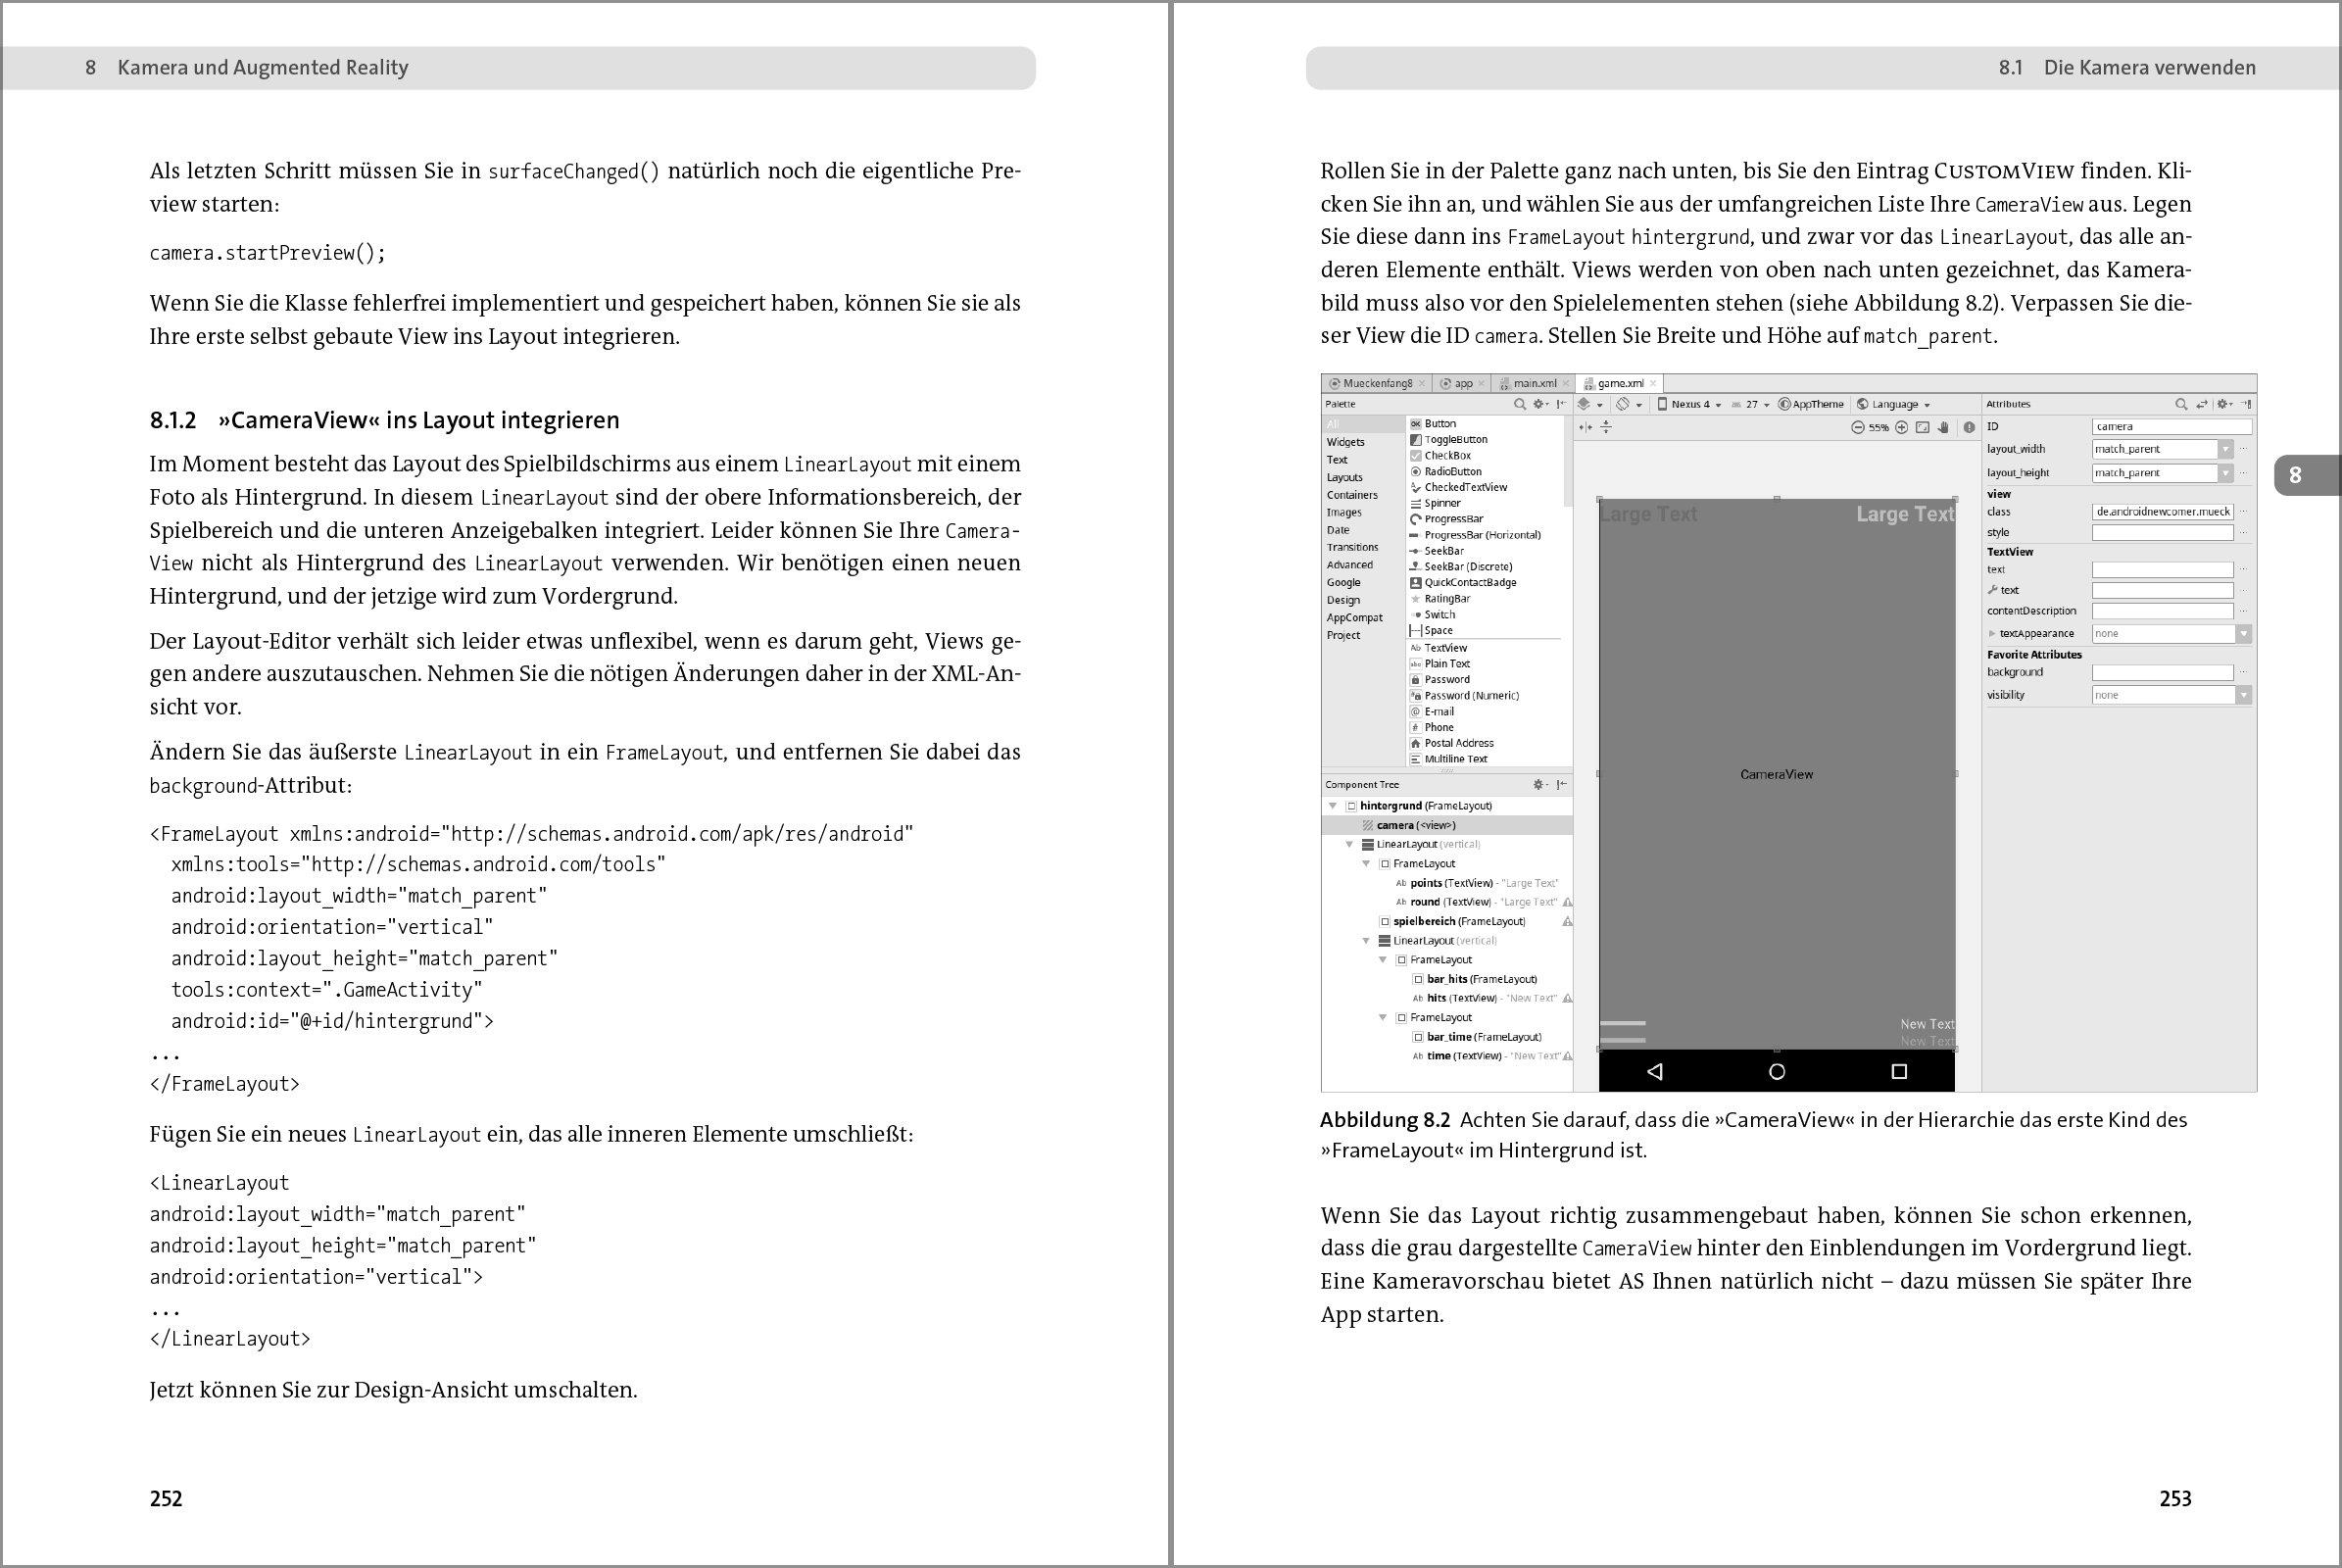 Charmant Wie Frame Layout In Android Verwenden Galerie - Rahmen ...